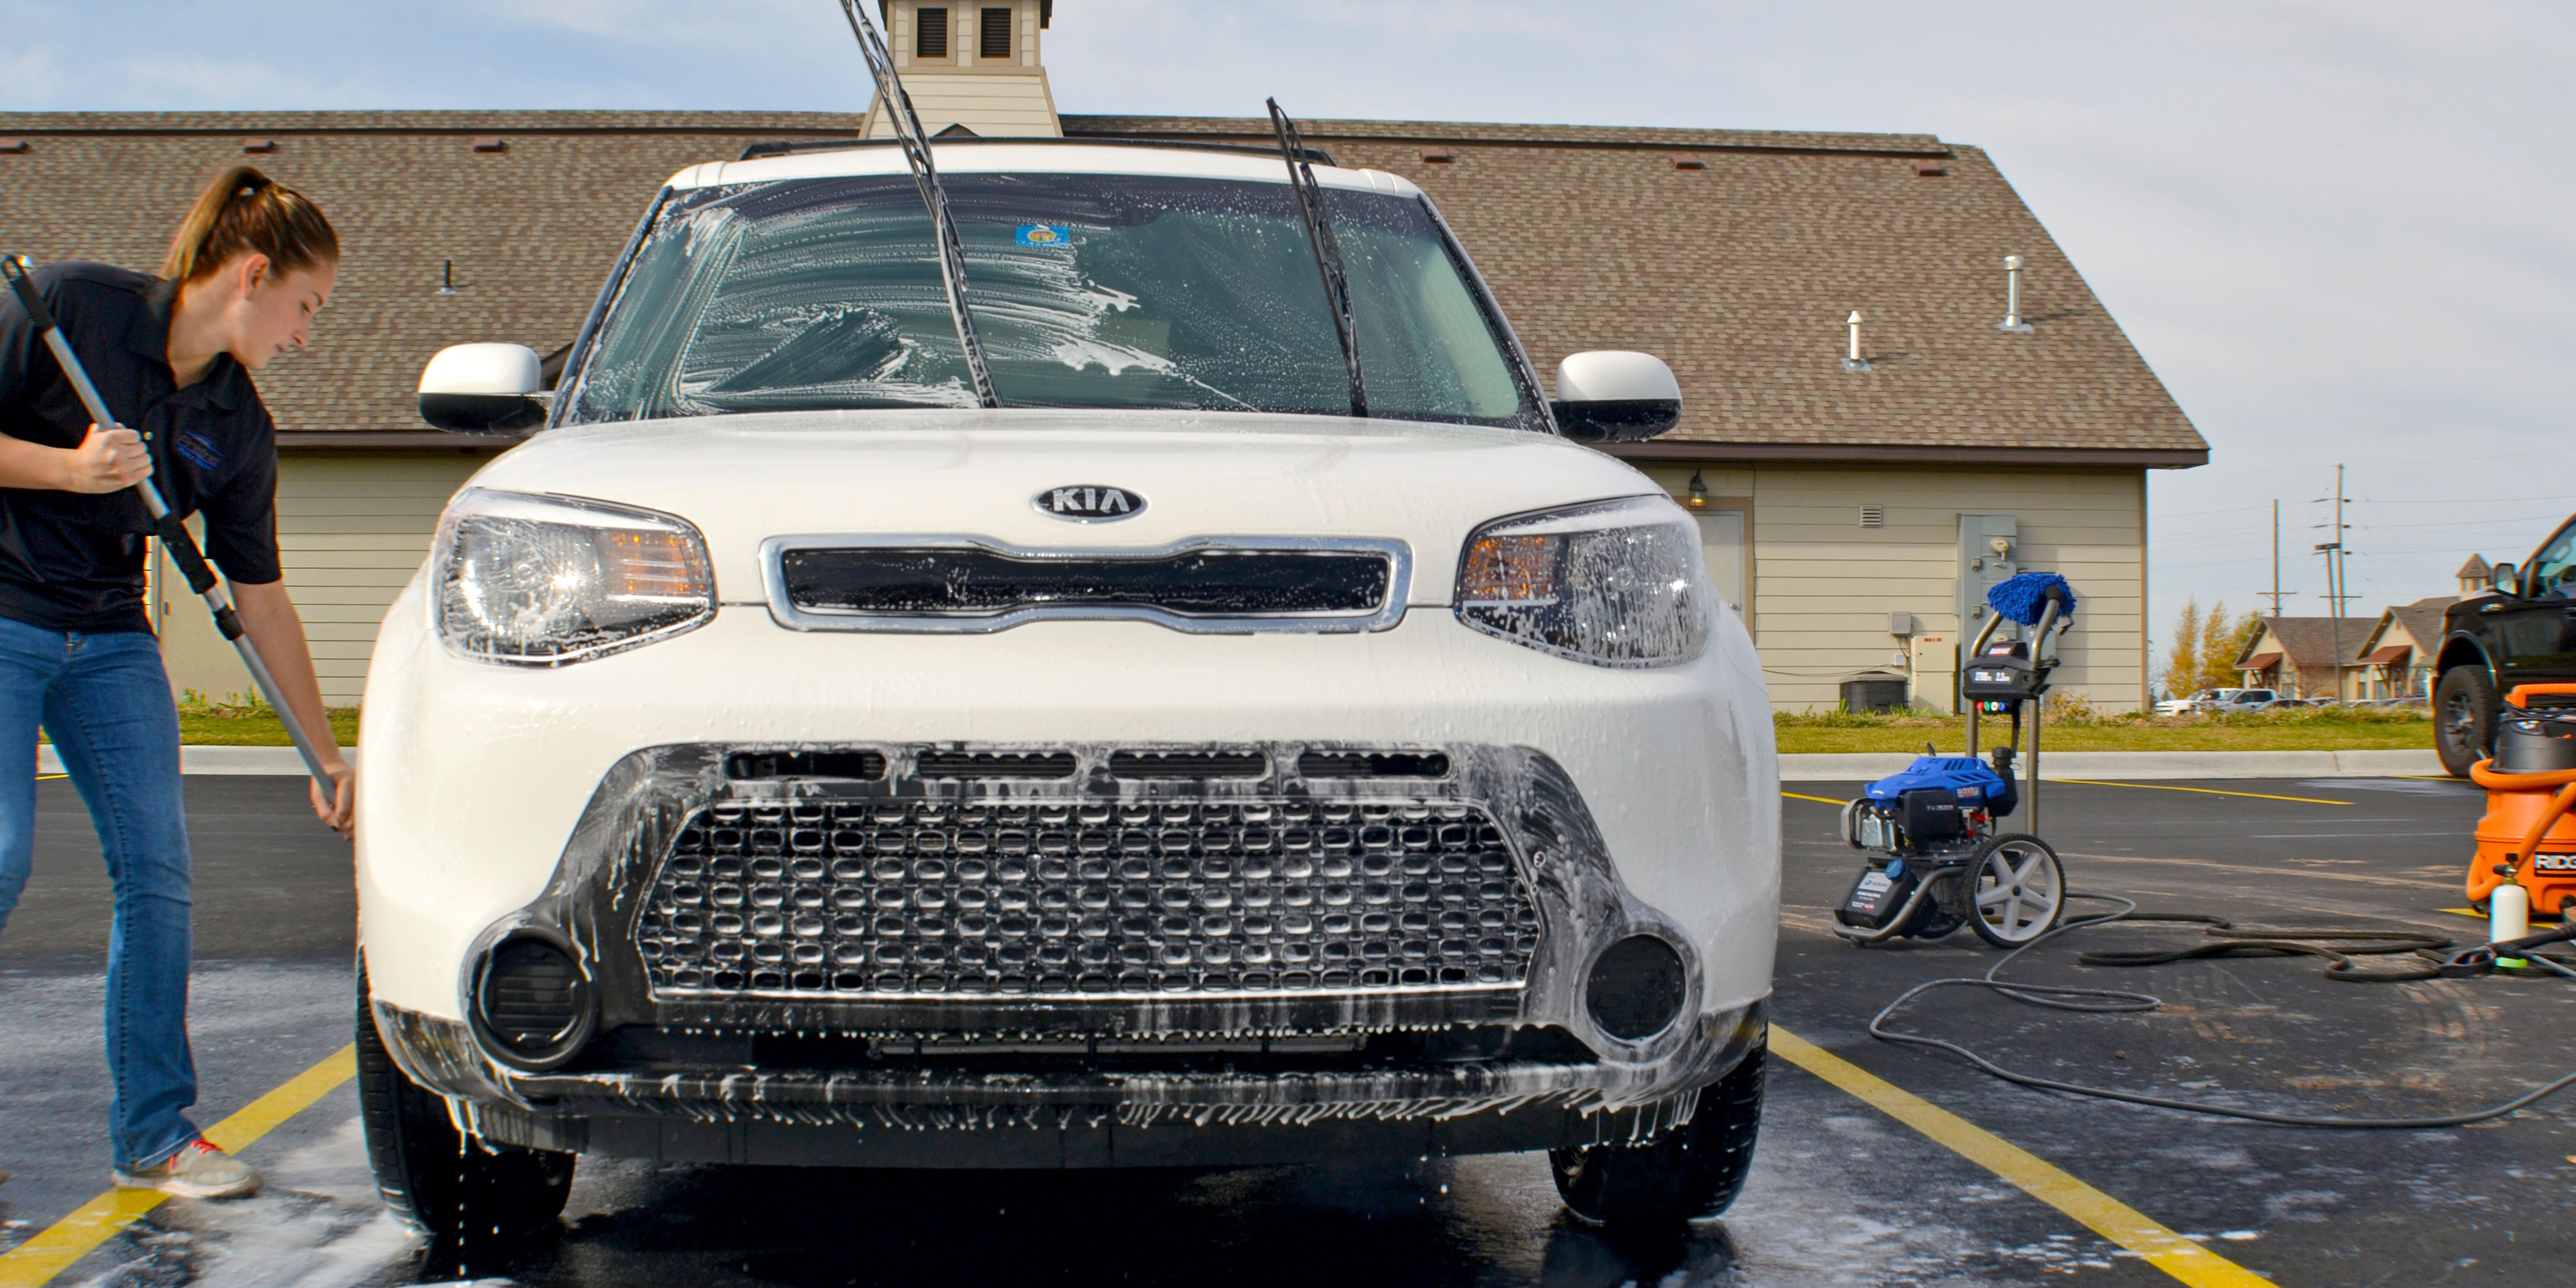 Full Service Car Wash Coeur D Alene